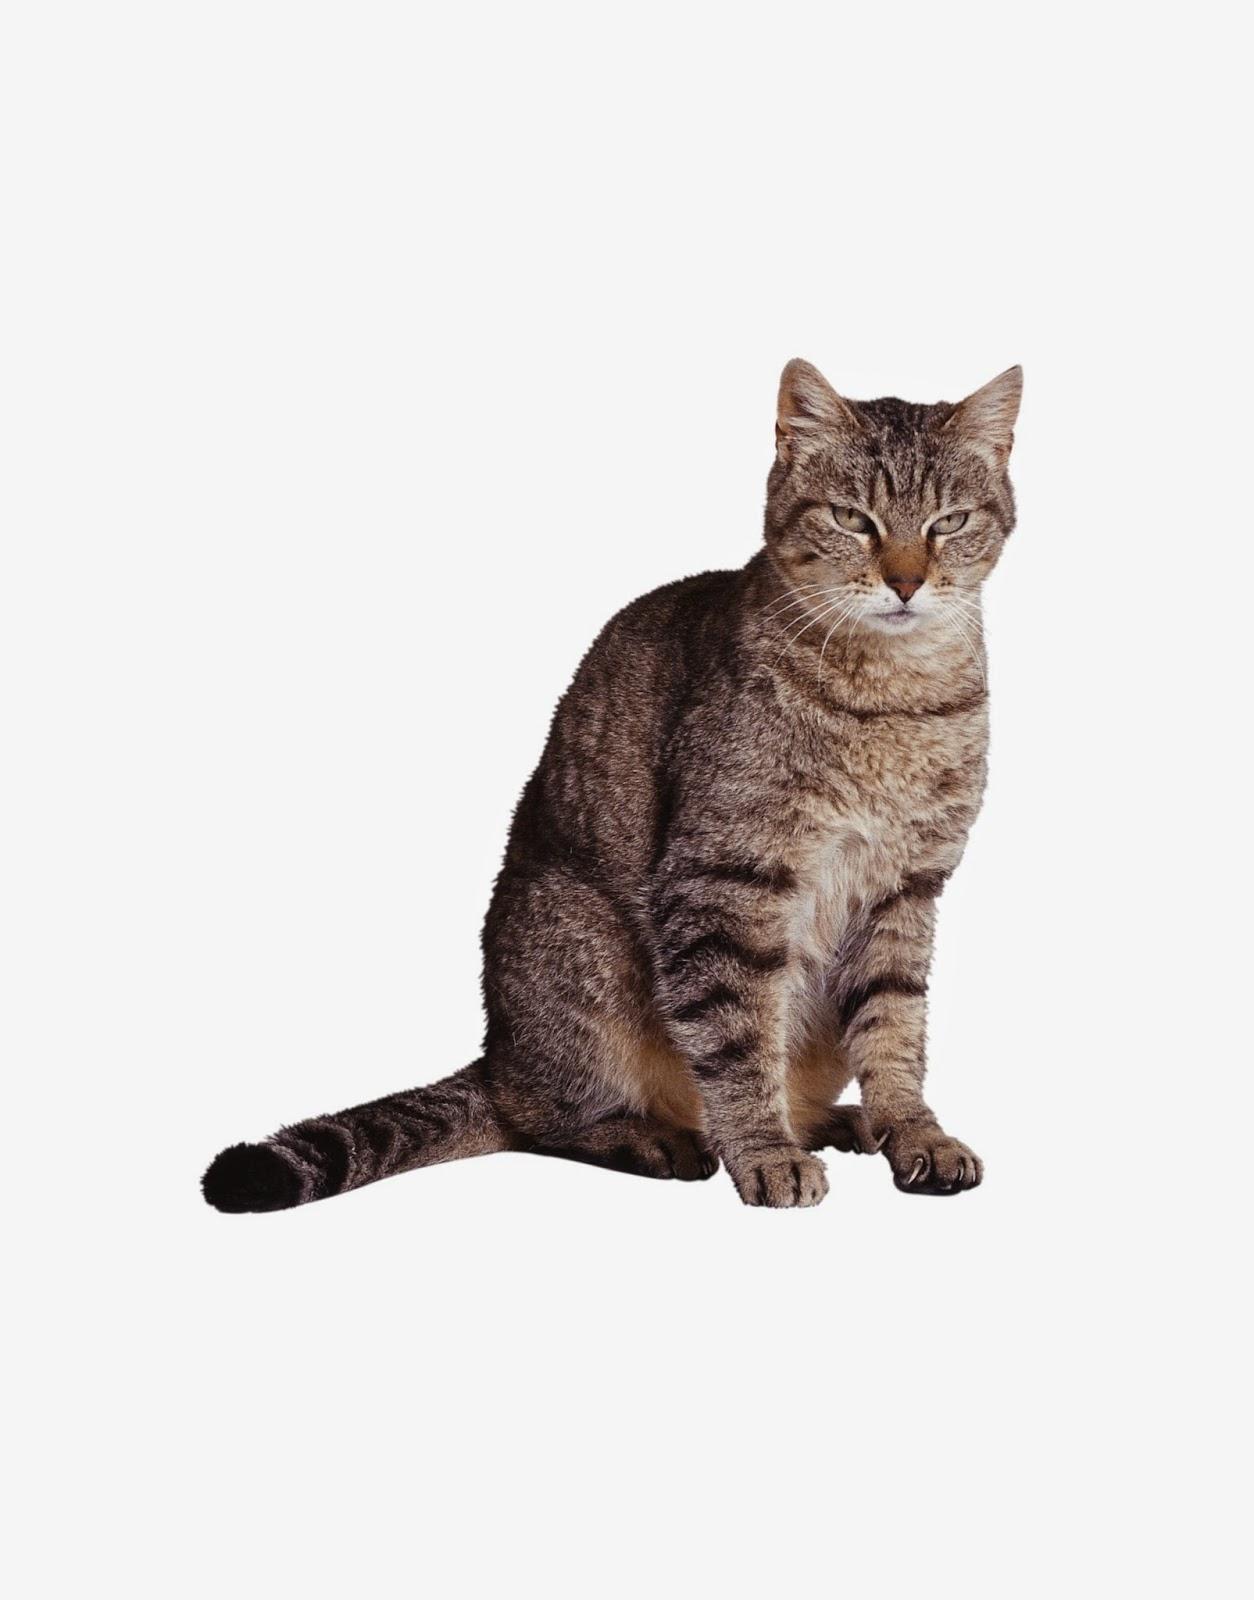 Картинки кошки для детей для занятия, про